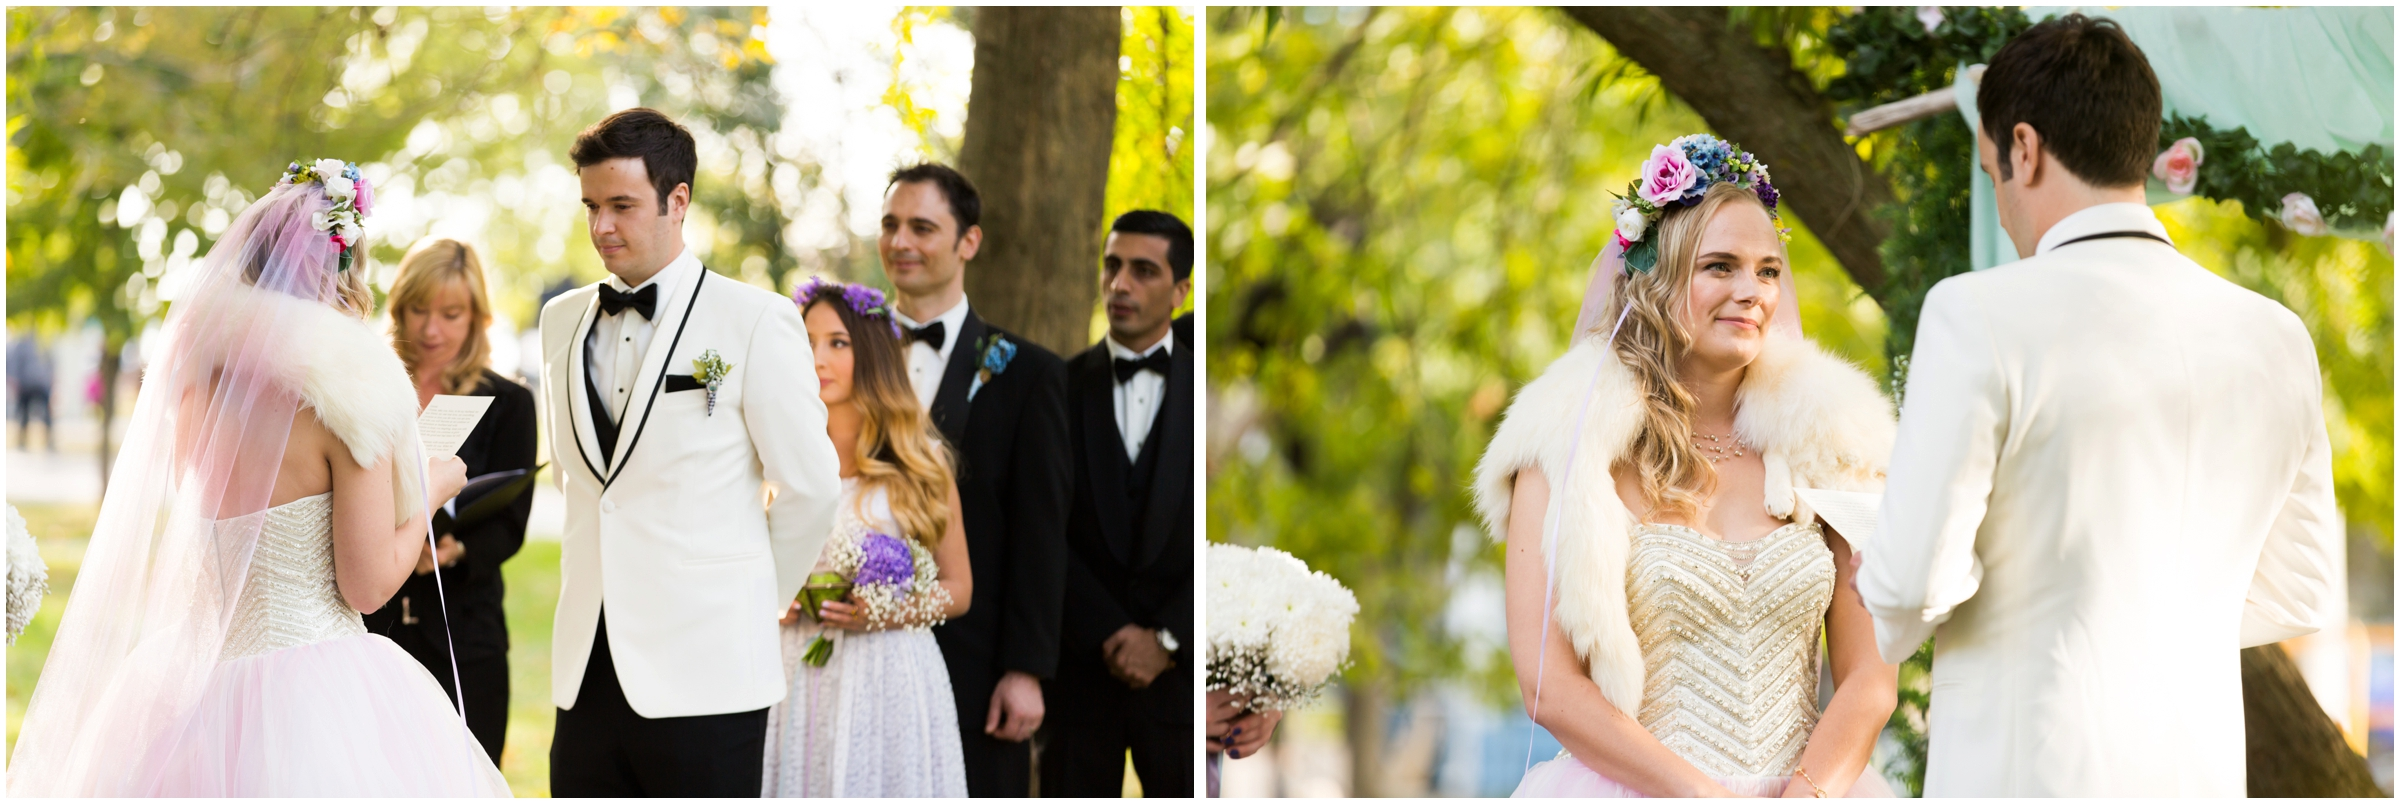 Life by Selena Wedding Photography_0007.jpg